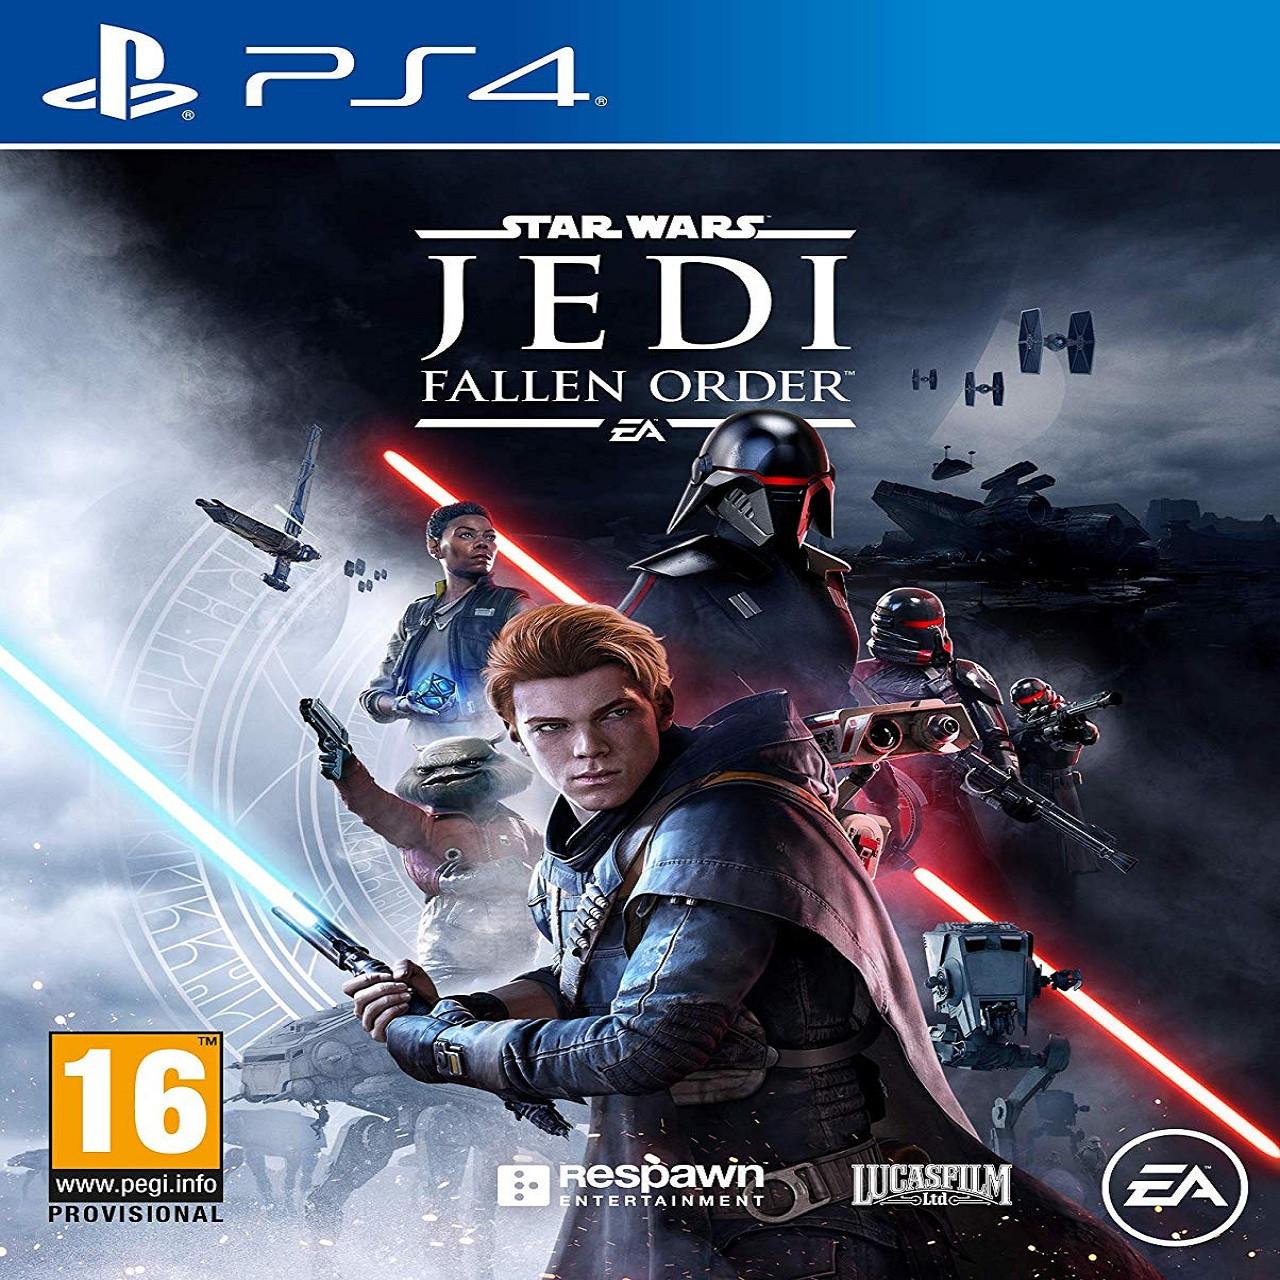 Star Wars Jedi: Fallen Order RUS PS4 (NEW)